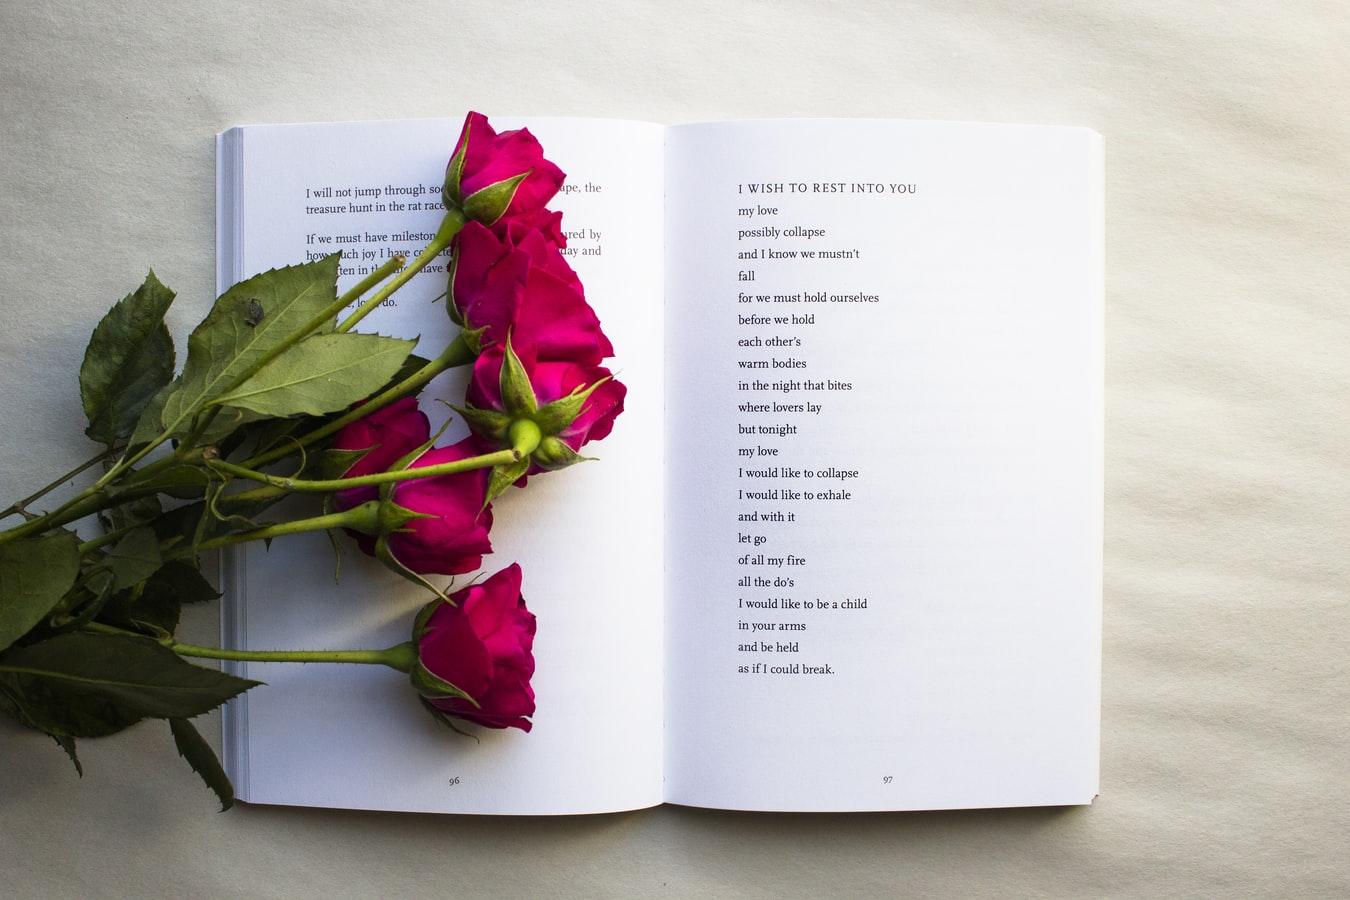 Charles Bukowski quotes are romantic and inspiring.